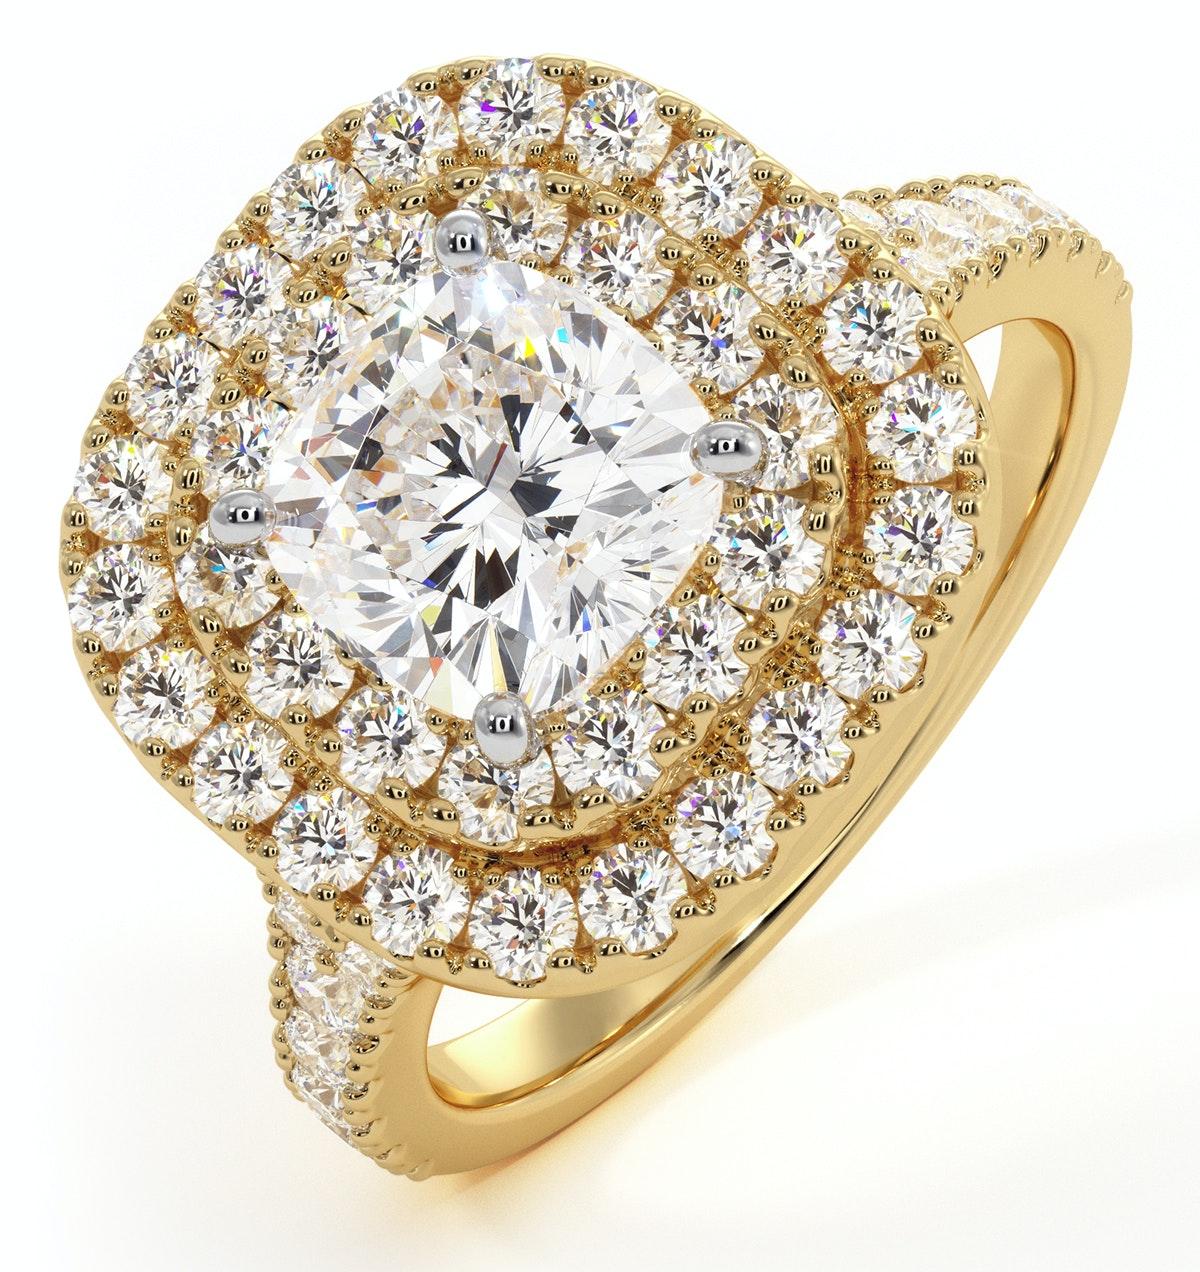 Anastasia GIA Diamond Halo Engagement Ring in 18K Gold 1.85ct G/VS1